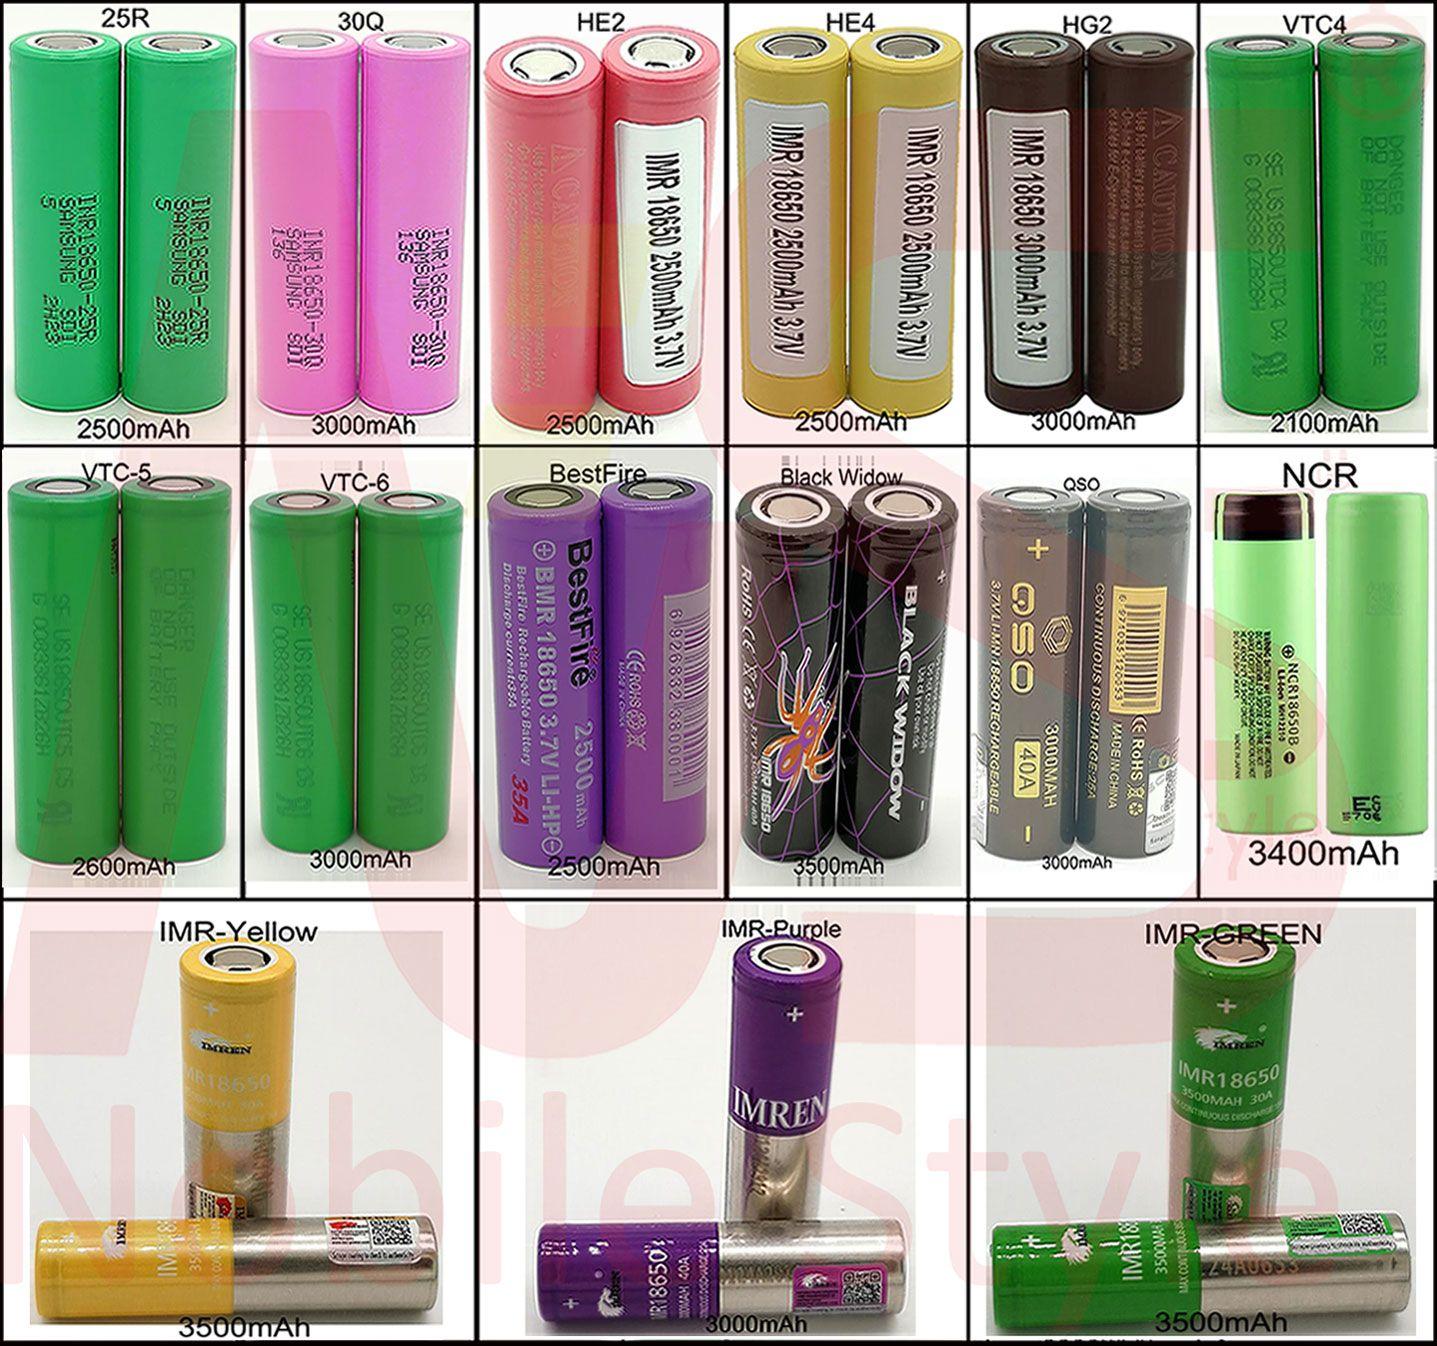 50pcs 18650 Lithium-Batterie Batterien High Drain 40A 3500mAh E CIG Vapes QSO 510 Thema NCR IMR VTC4 VTC5 VTC6 25R 30Q HE2 HE4 HG2 Mod Palm